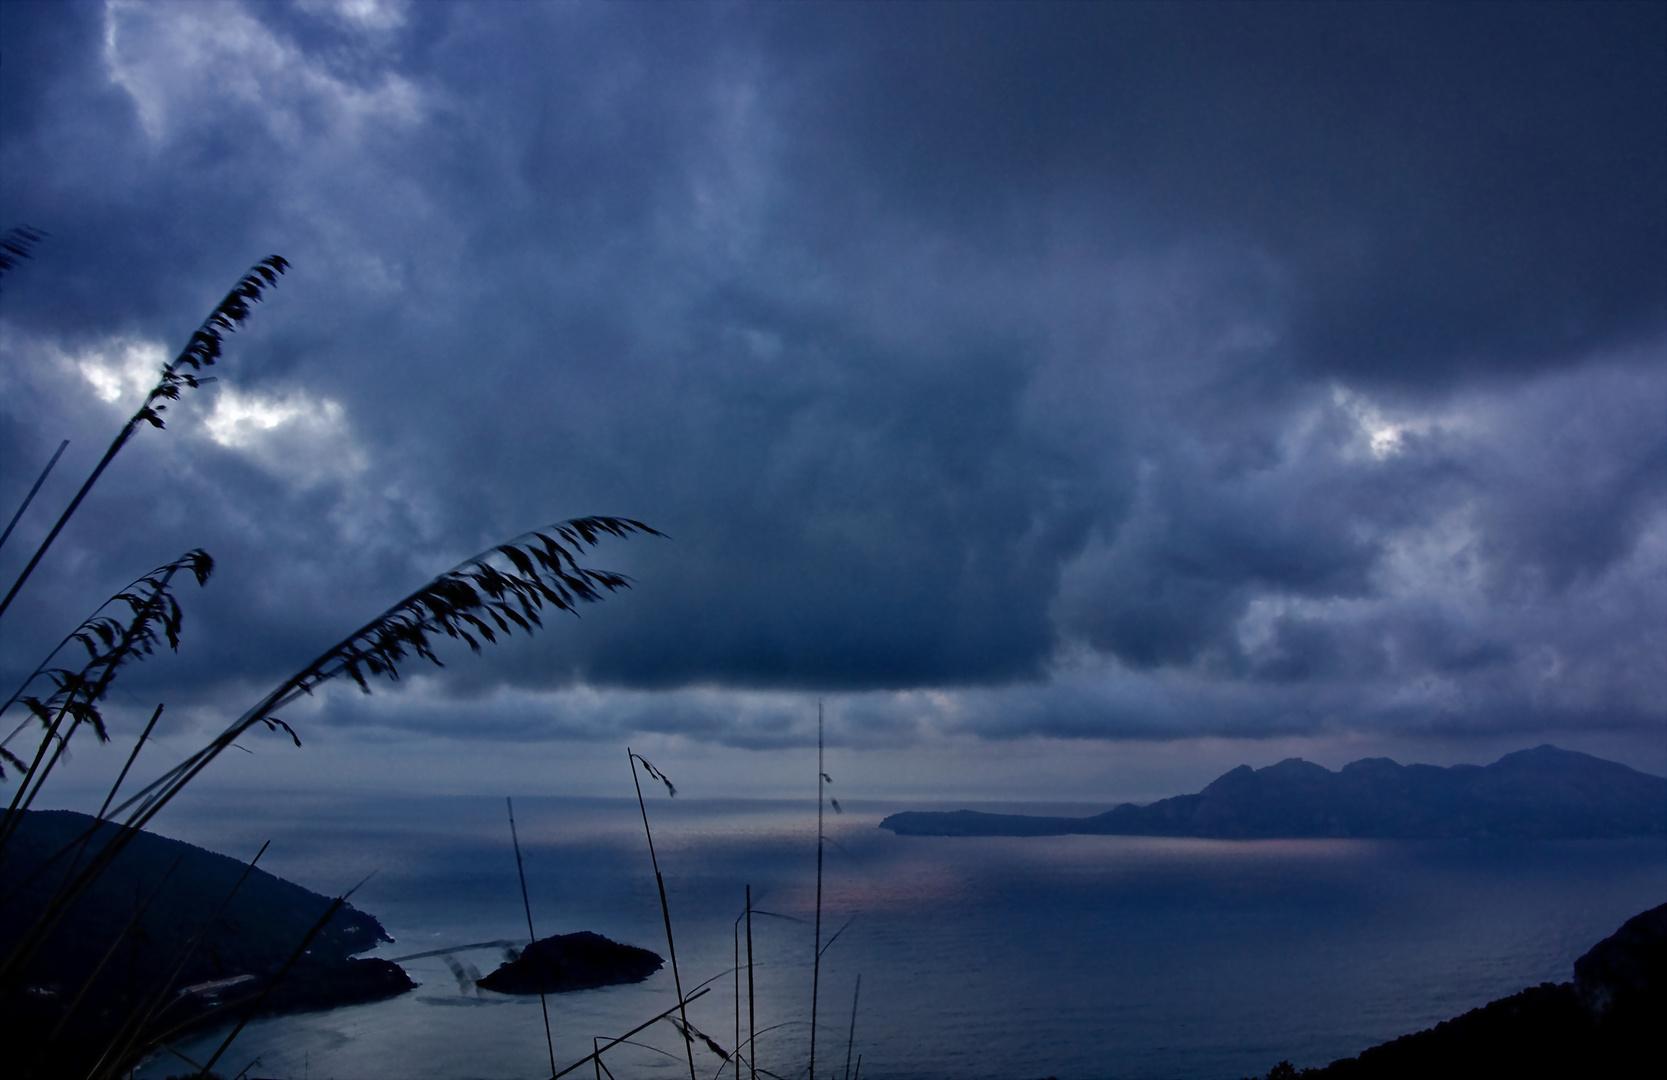 Amanecer tormentoso (Dedicada a Montse Trilla y MIQ)